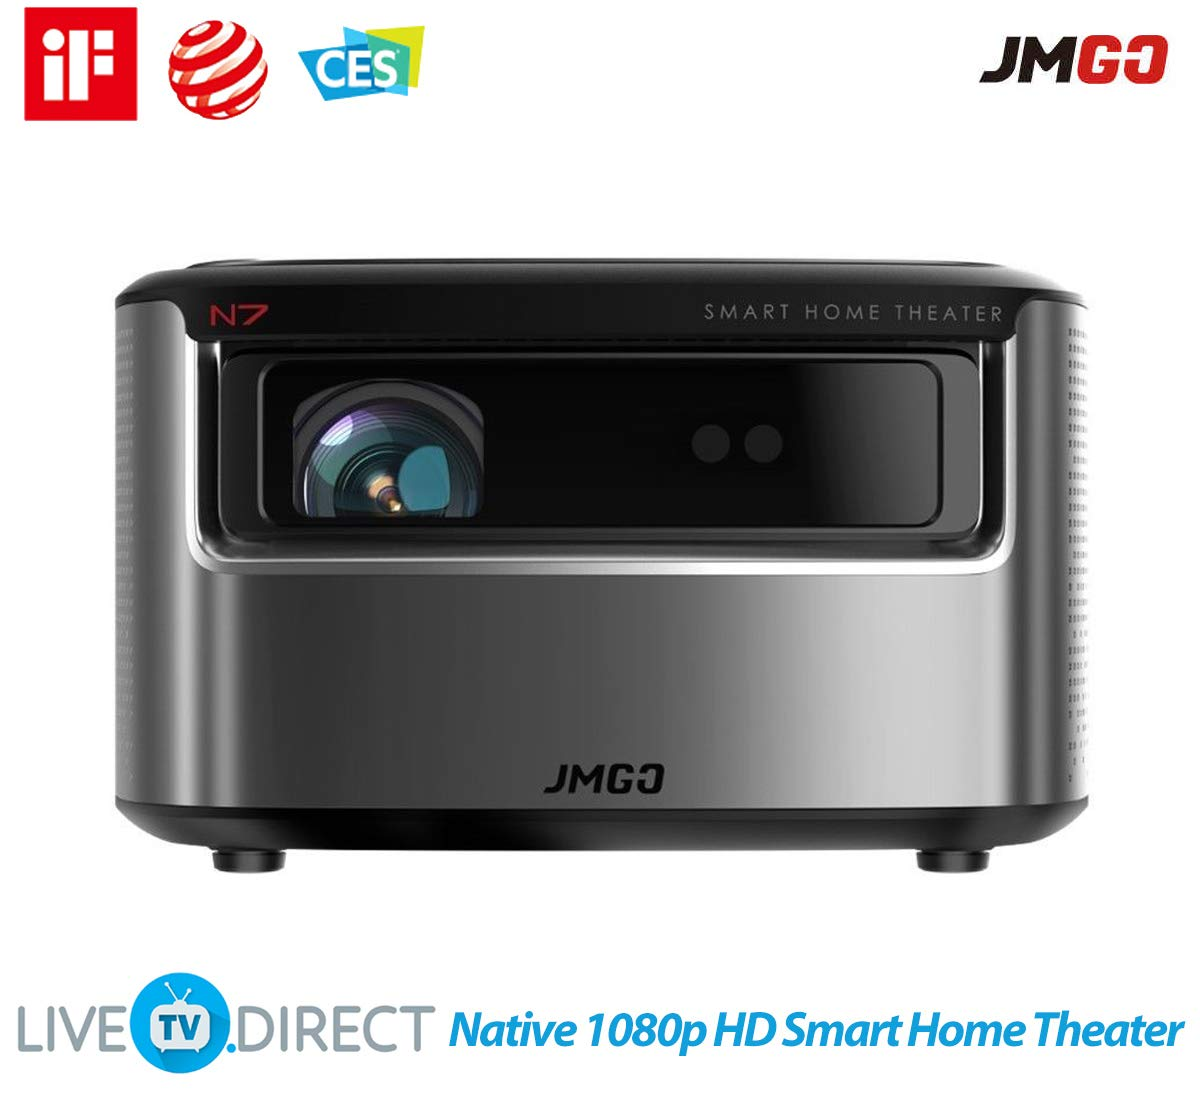 Amazon.com: Proyector, JmGO N7 Nativo 1080p HD Home Theater ...